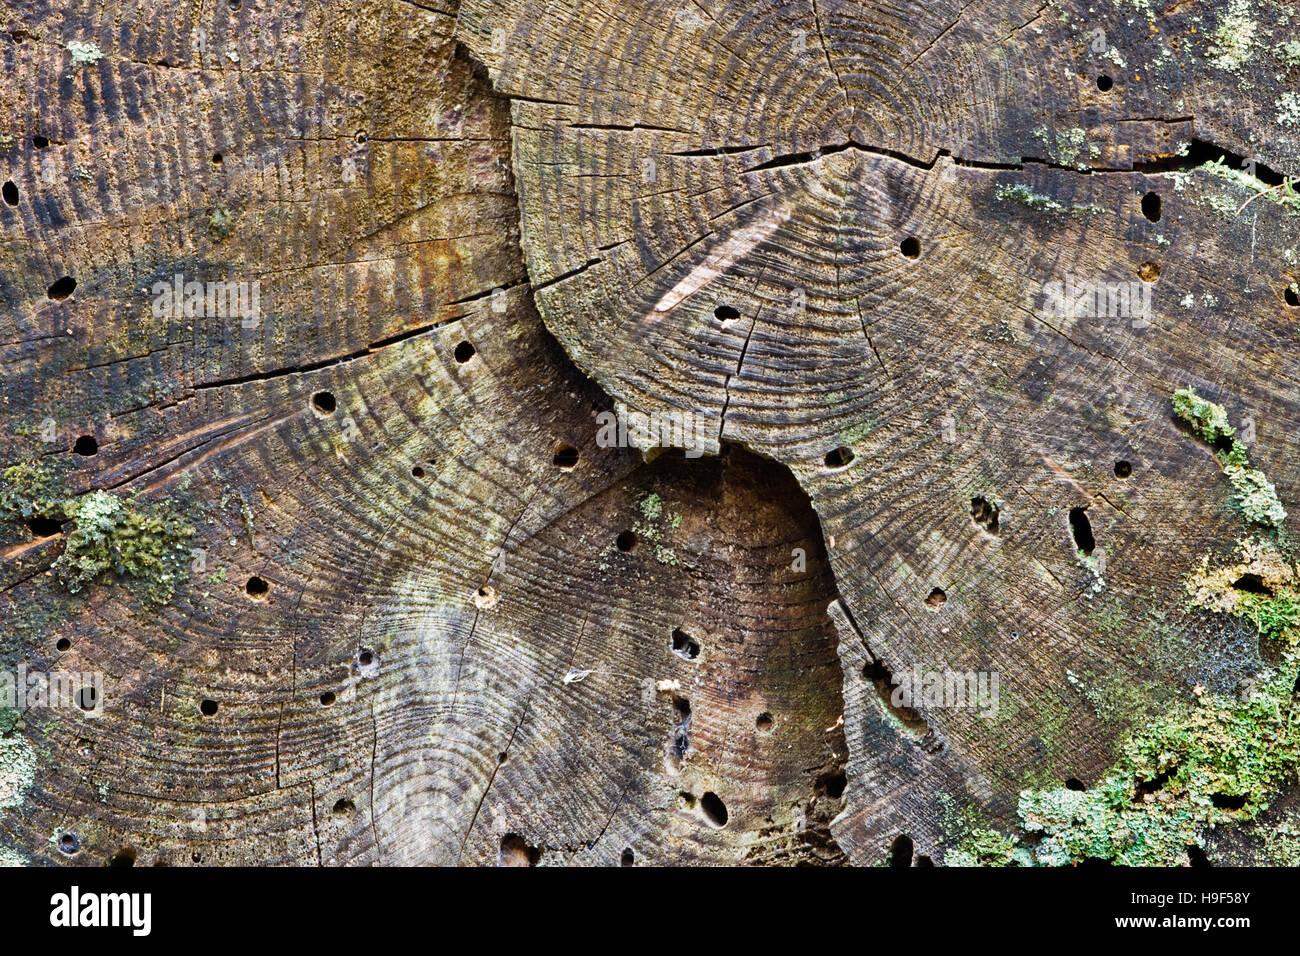 woodworm stockfotos woodworm bilder alamy. Black Bedroom Furniture Sets. Home Design Ideas